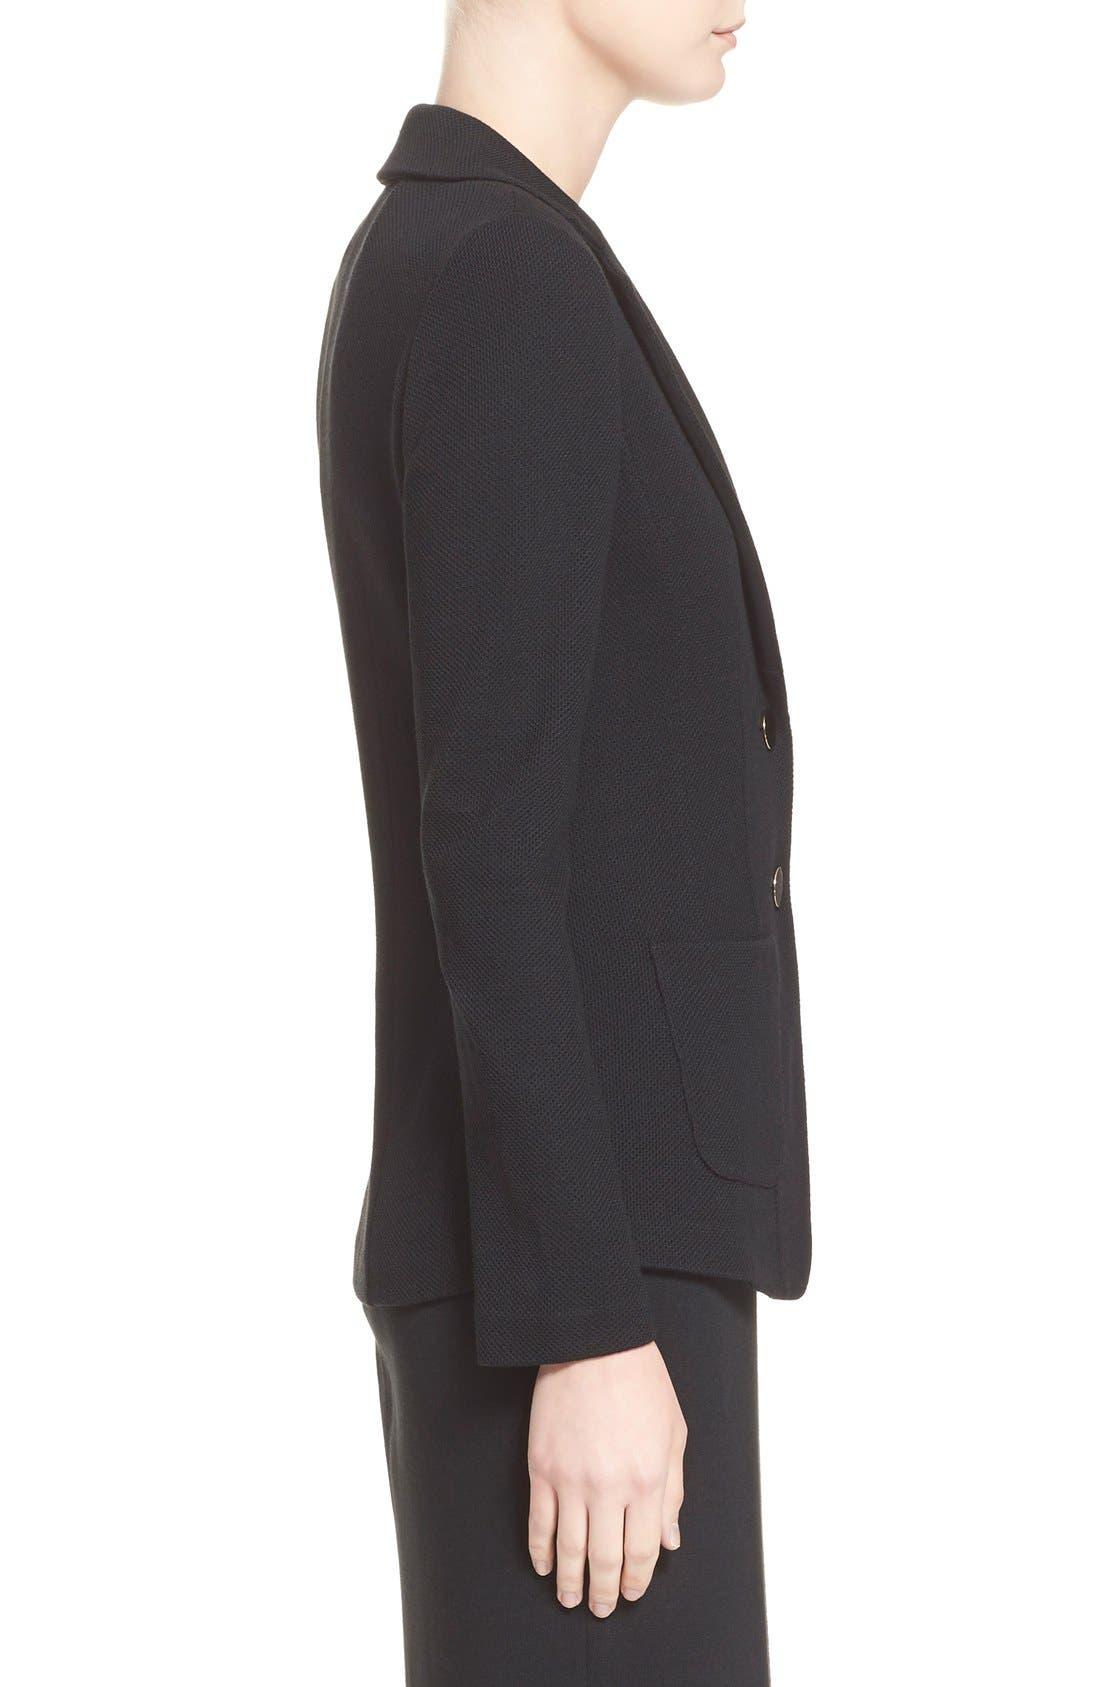 ST. JOHN COLLECTION, Milano Piqué Knit Jacket, Alternate thumbnail 5, color, CAVIAR